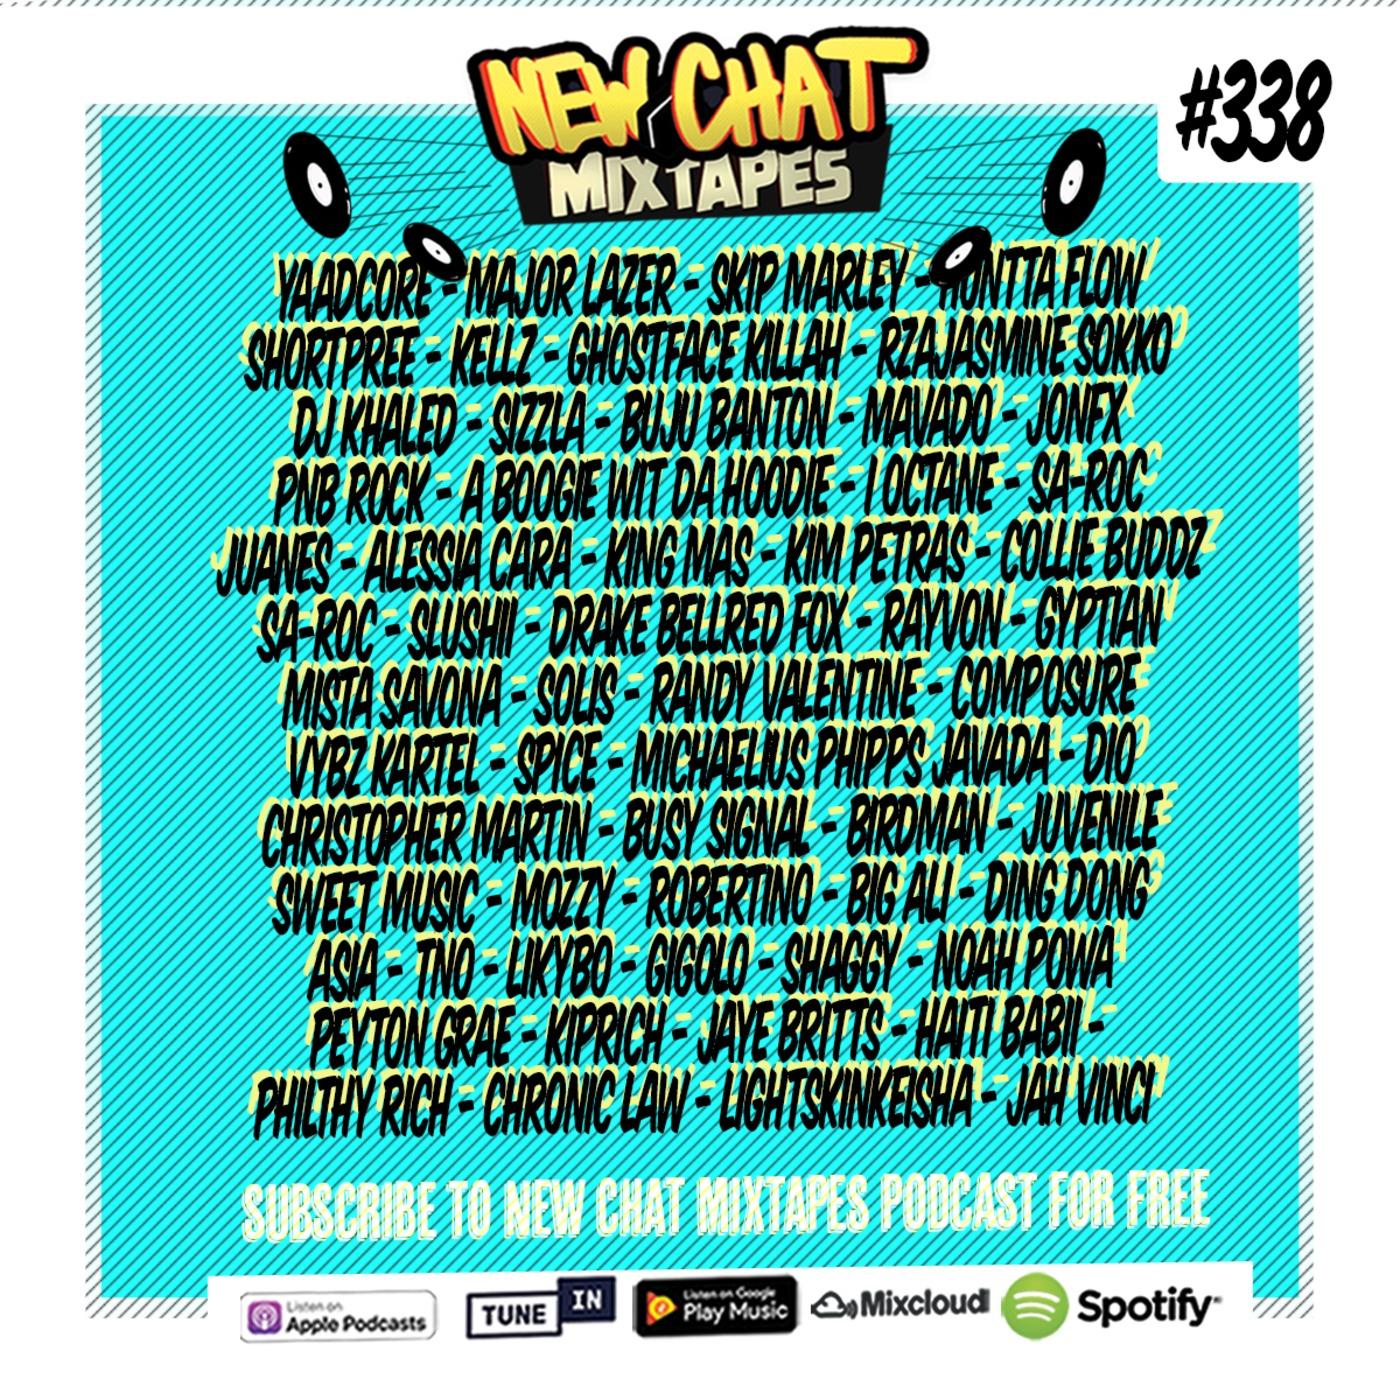 New Chat Mixtapes #338 - YUSH! 5-27-19 Live Mix By